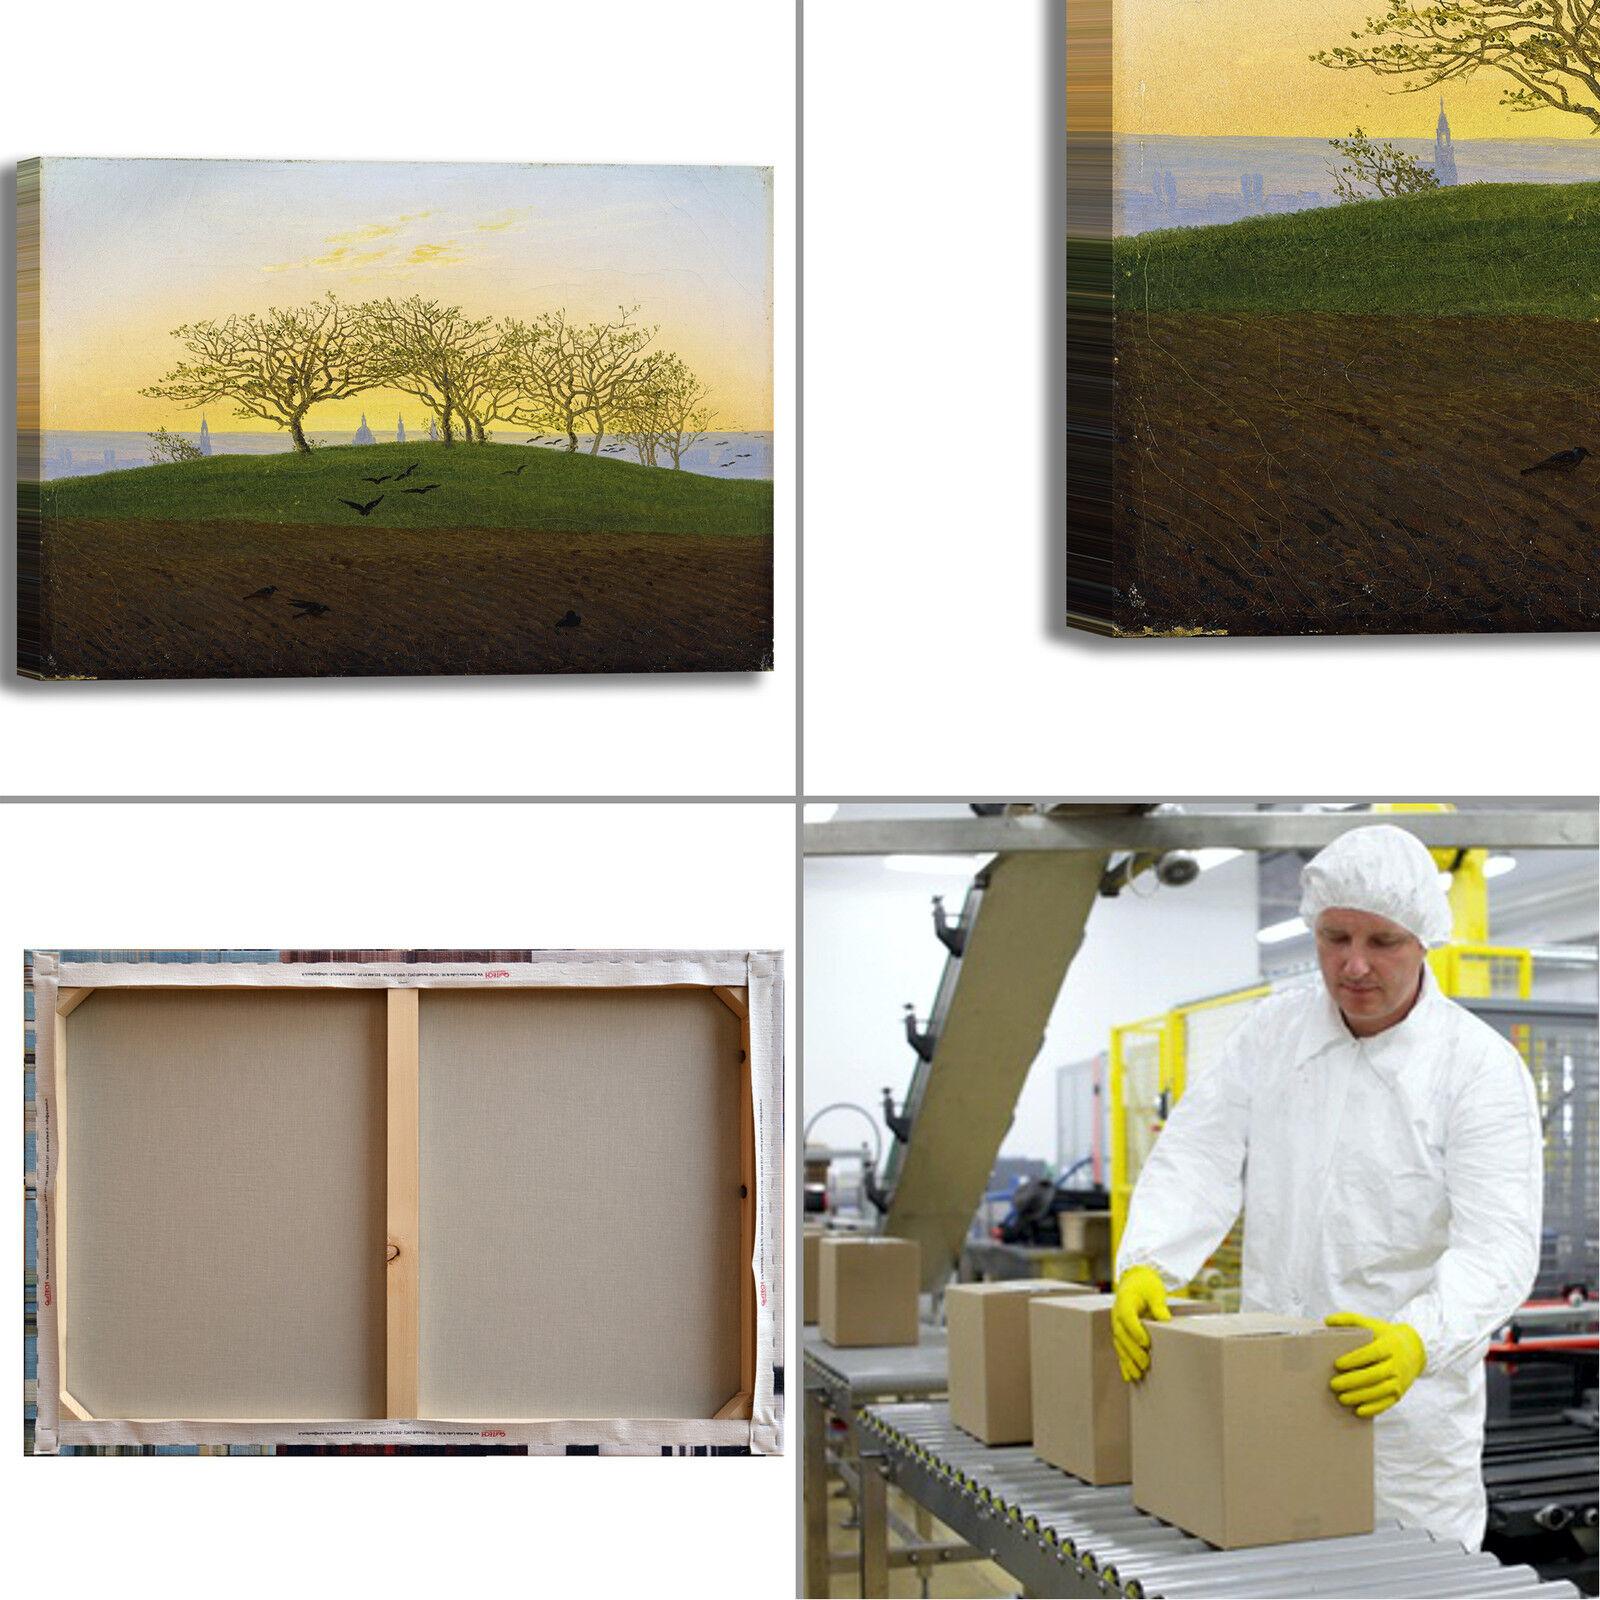 Caspar collina tela campo arato design quadro stampa tela collina dipinto telaio arRouge o casa 479c1e